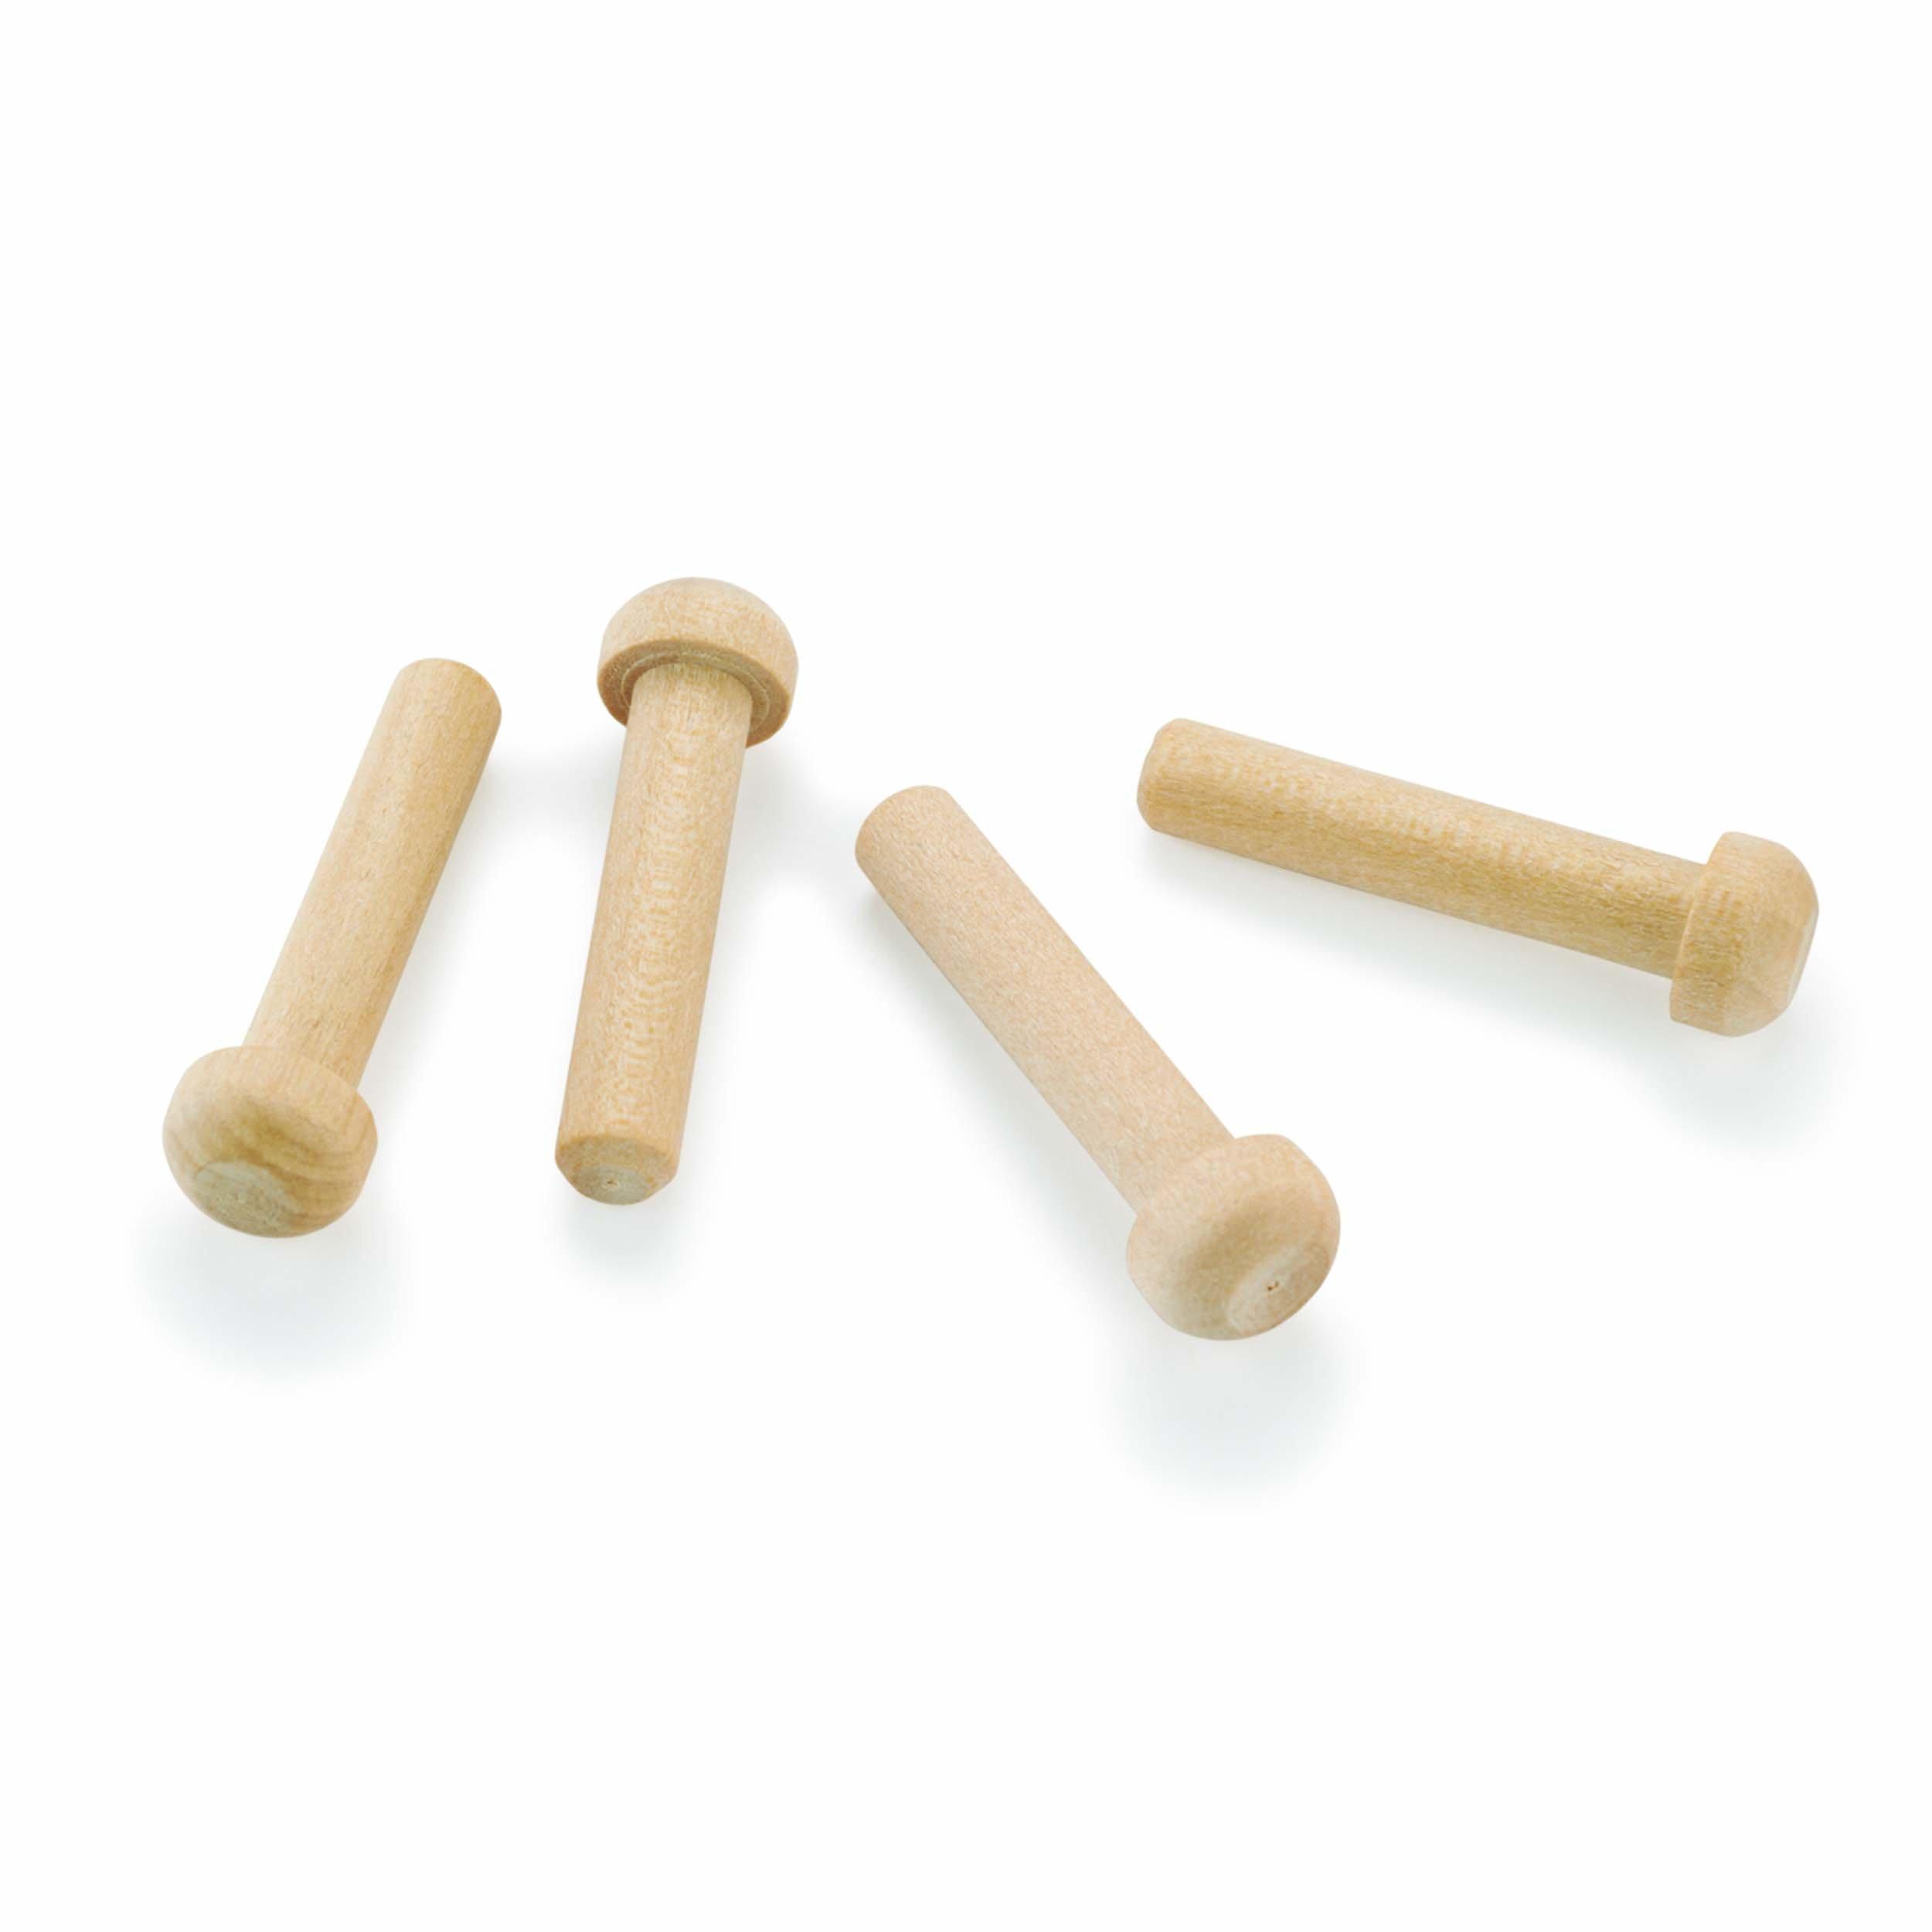 Axle Pegs 7/32'' Diameter x 1-3/16'' Long, Maple 8-piece